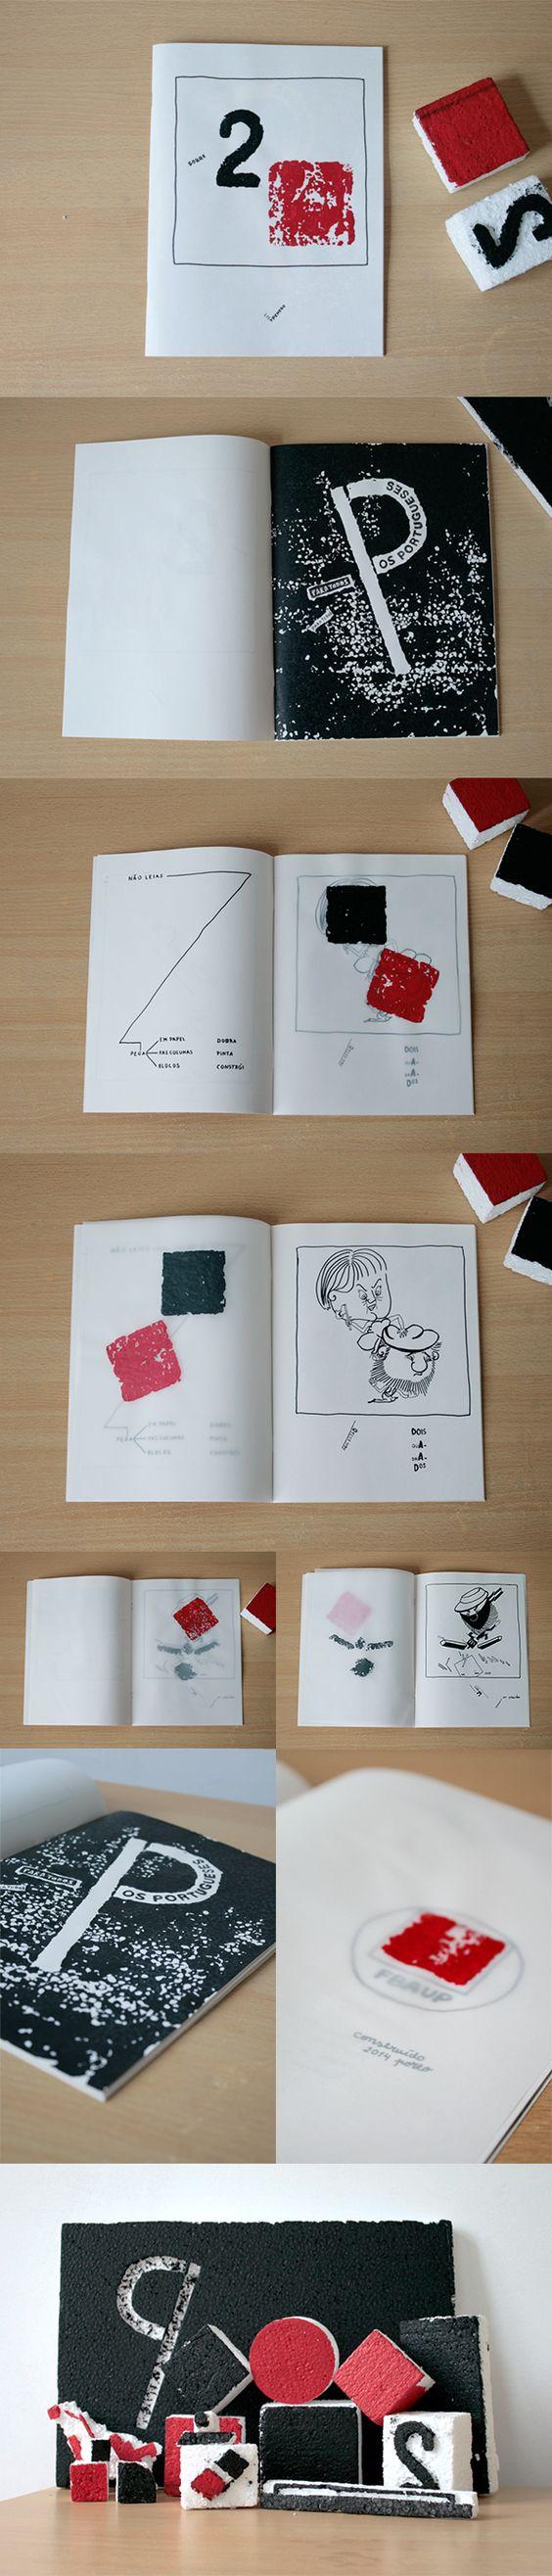 El Lissitzky Homage — Fanzine on Behance